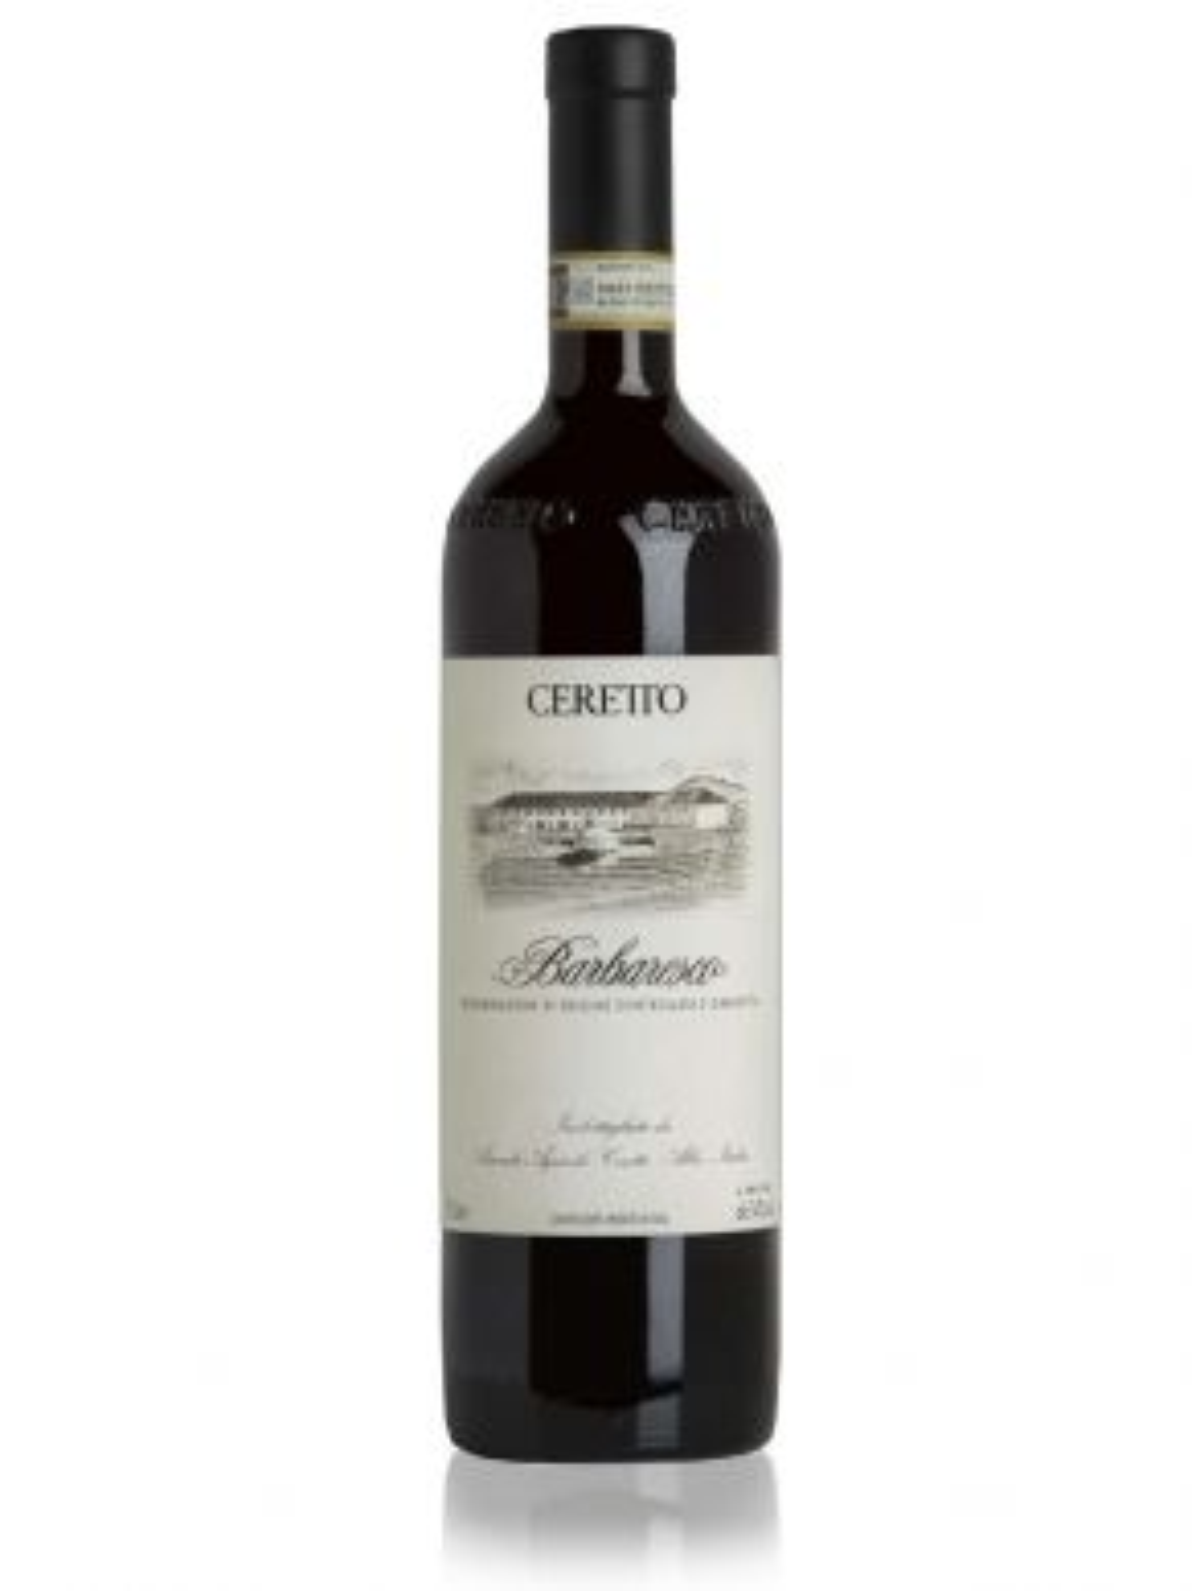 Ceretto Barbaresco 2015 DOCG Italy Red Wine 75cl